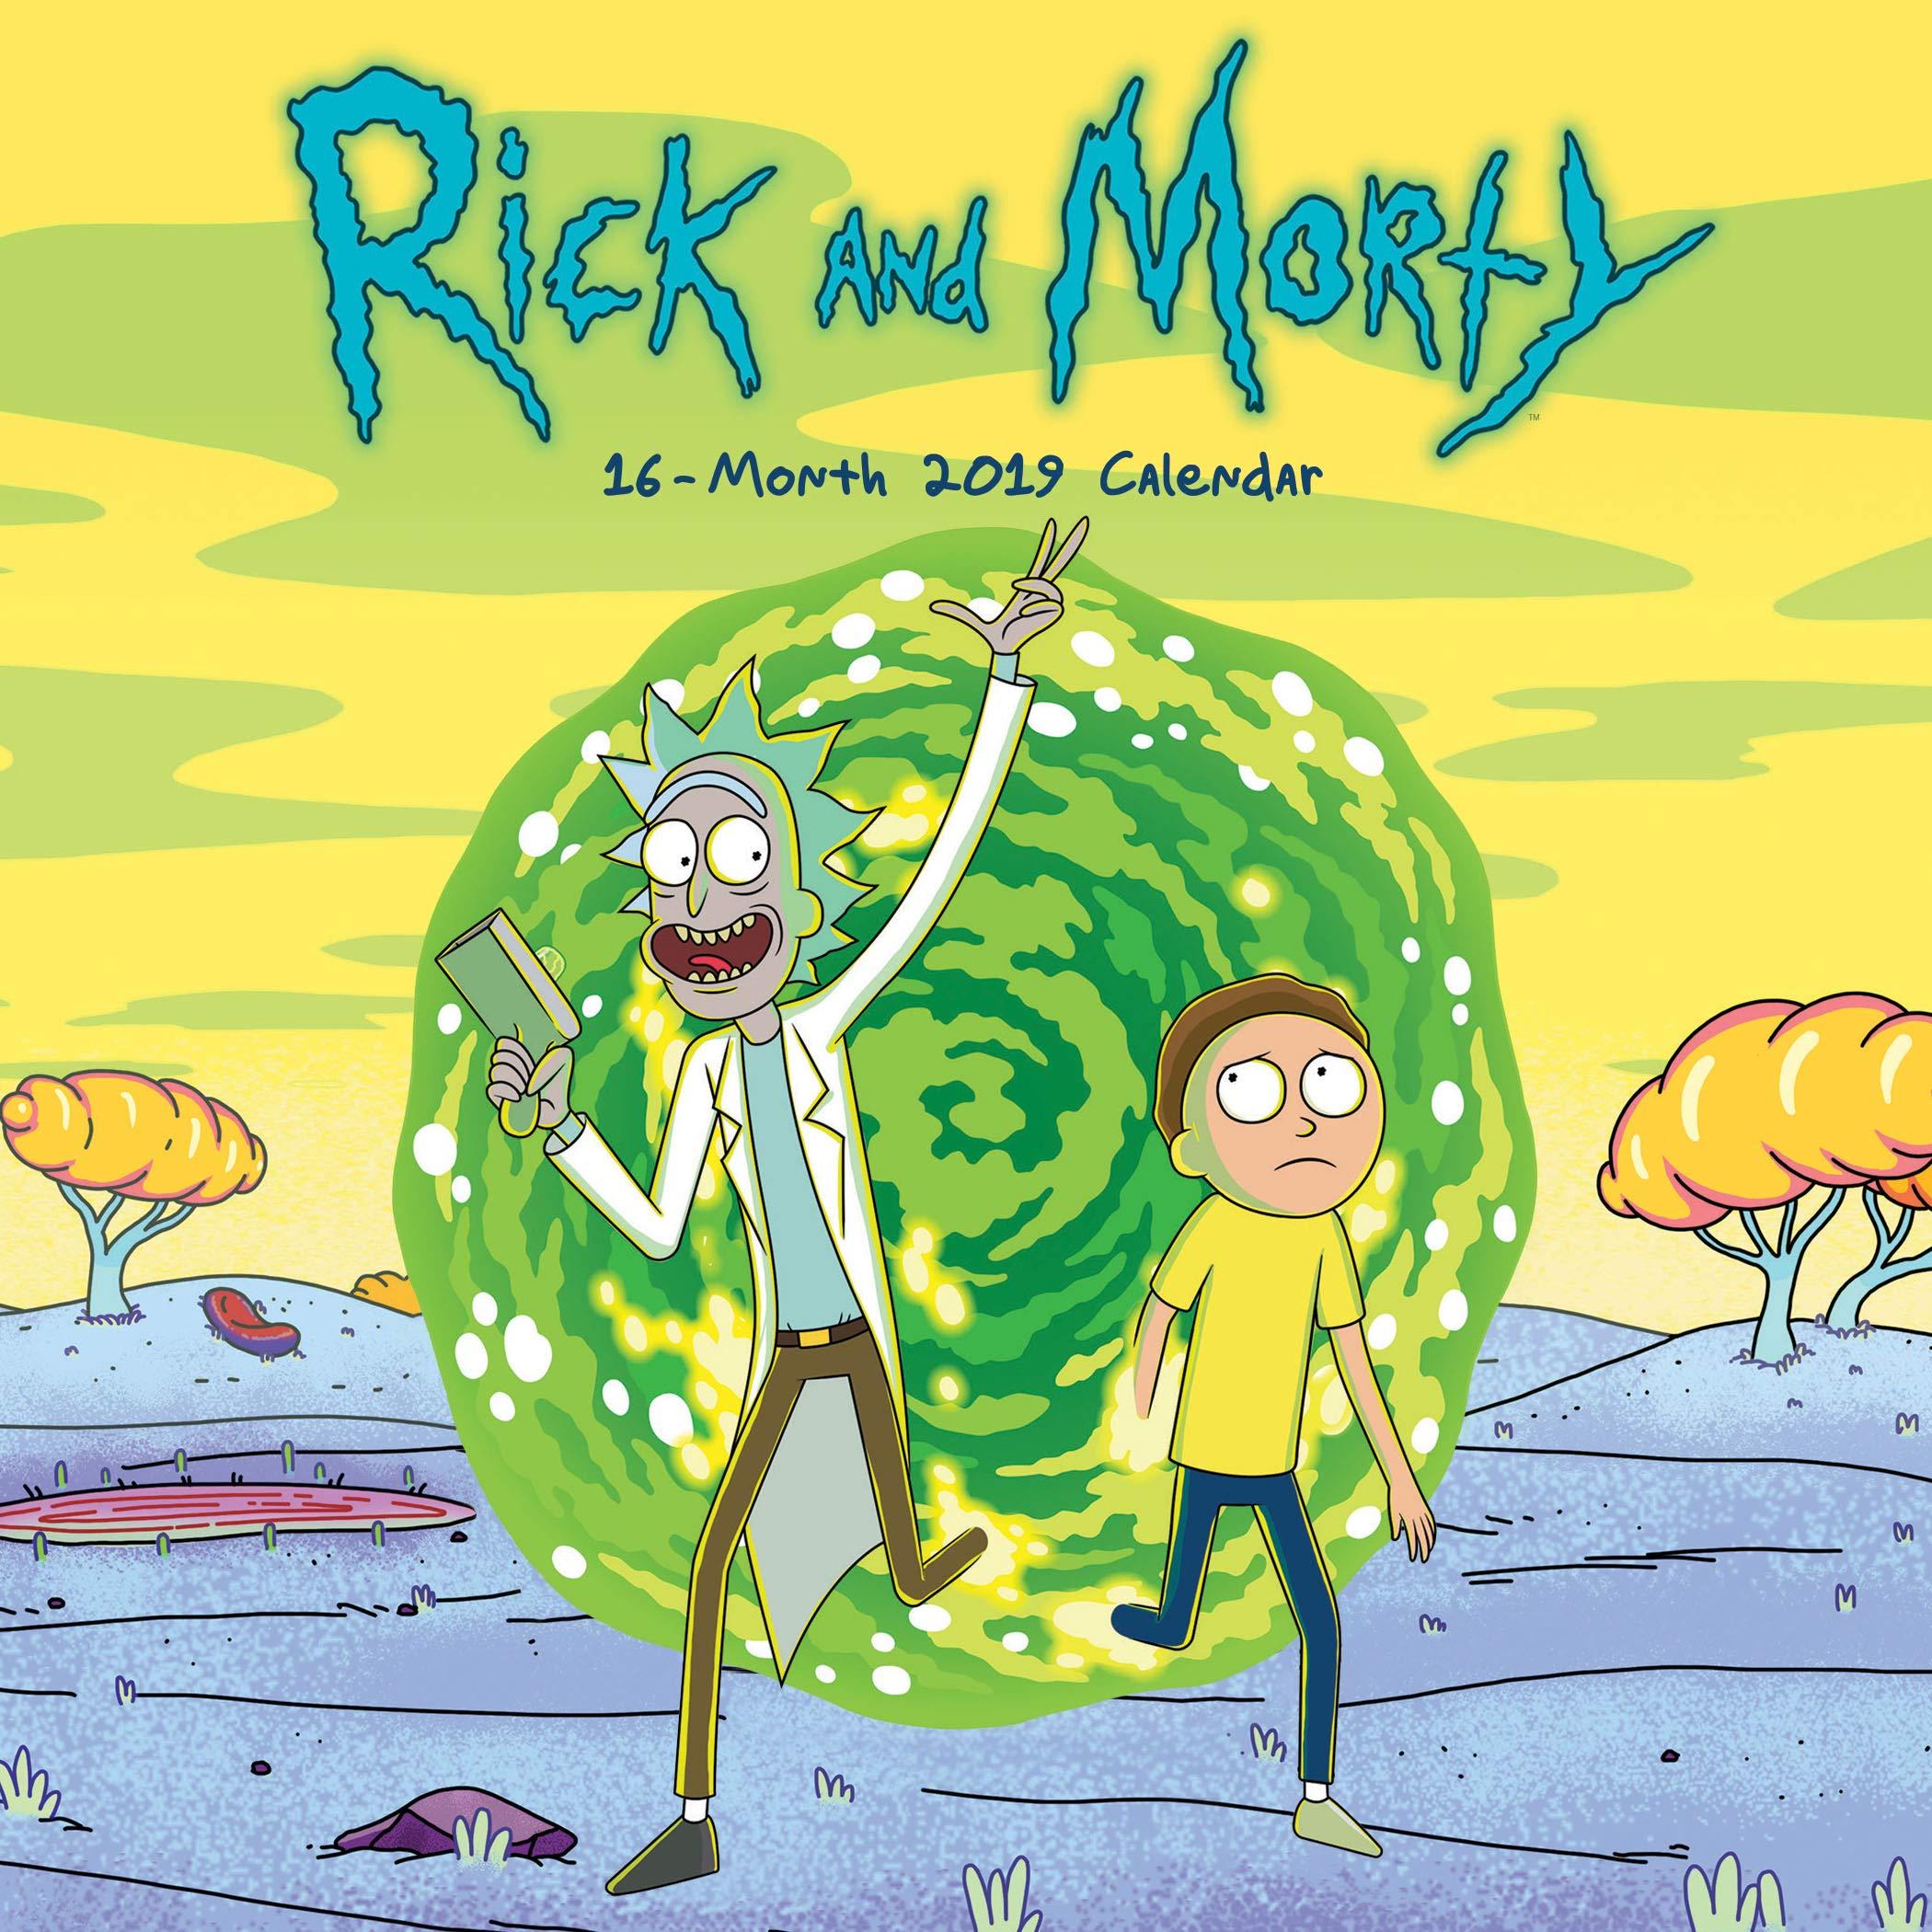 Calendario Coop 2020.2019 Rick And Morty Mini Calendar Trends International